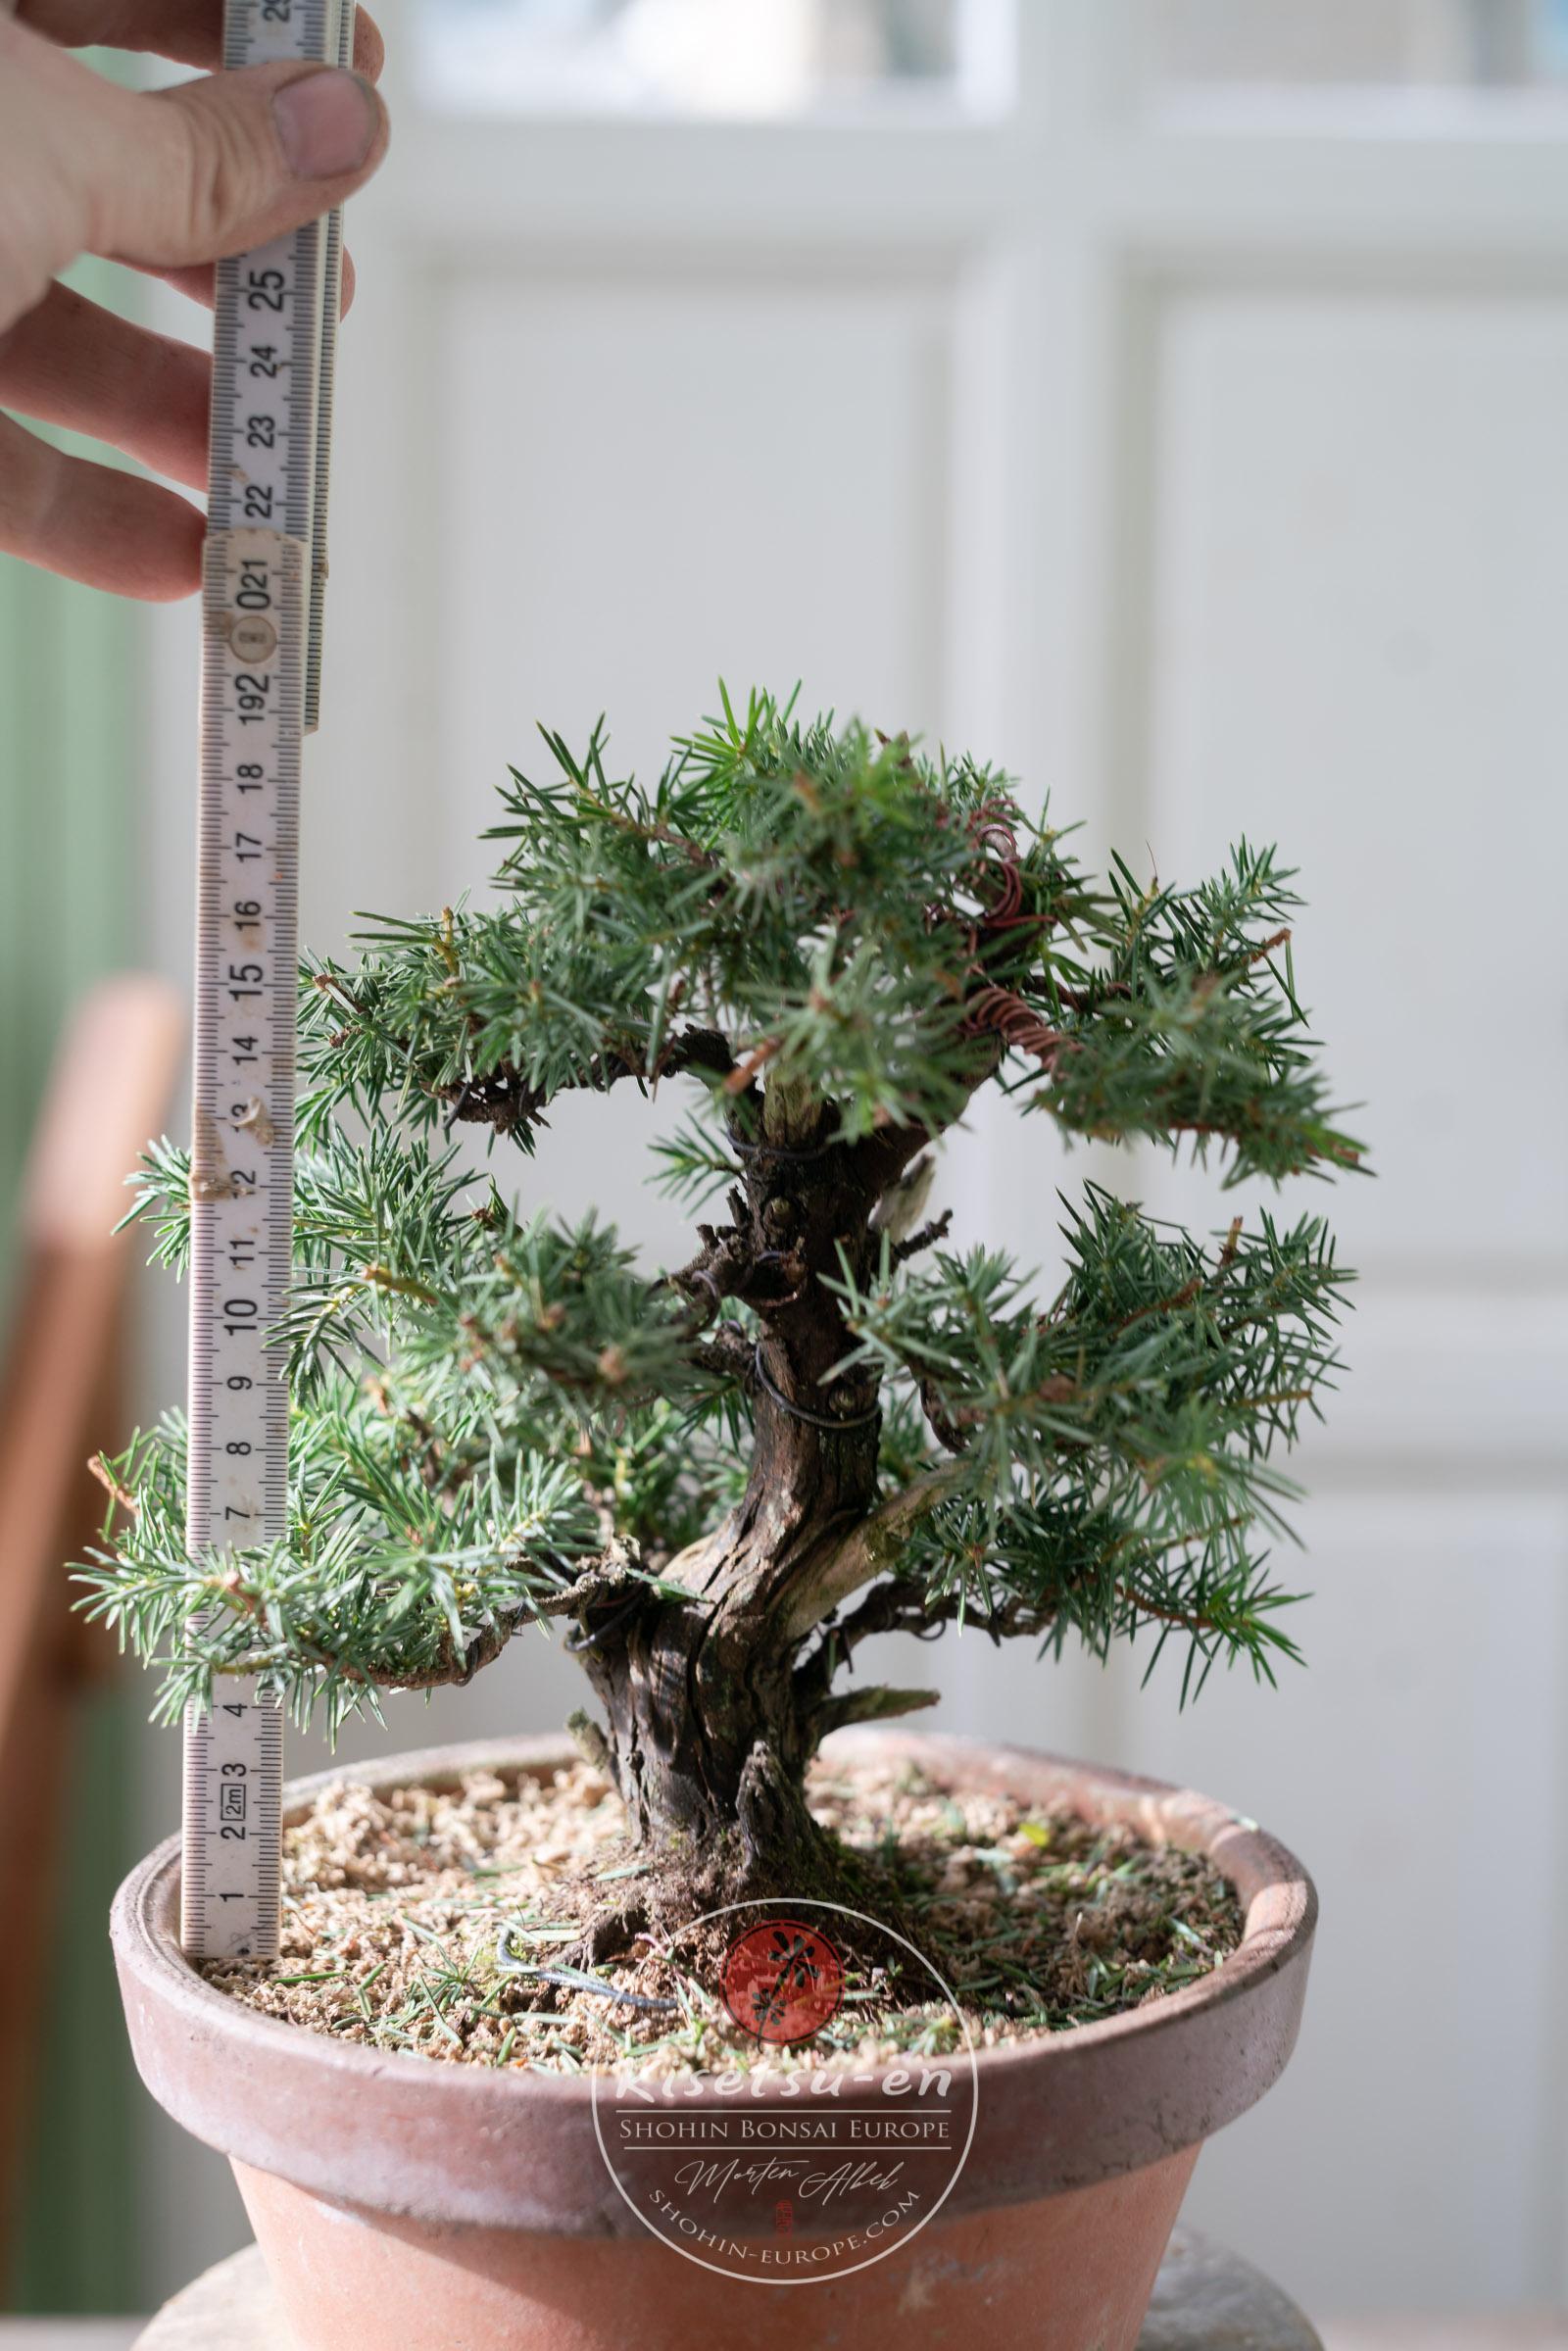 Repotting Season Has Started Kisetsu En Shohin Bonsai Europe